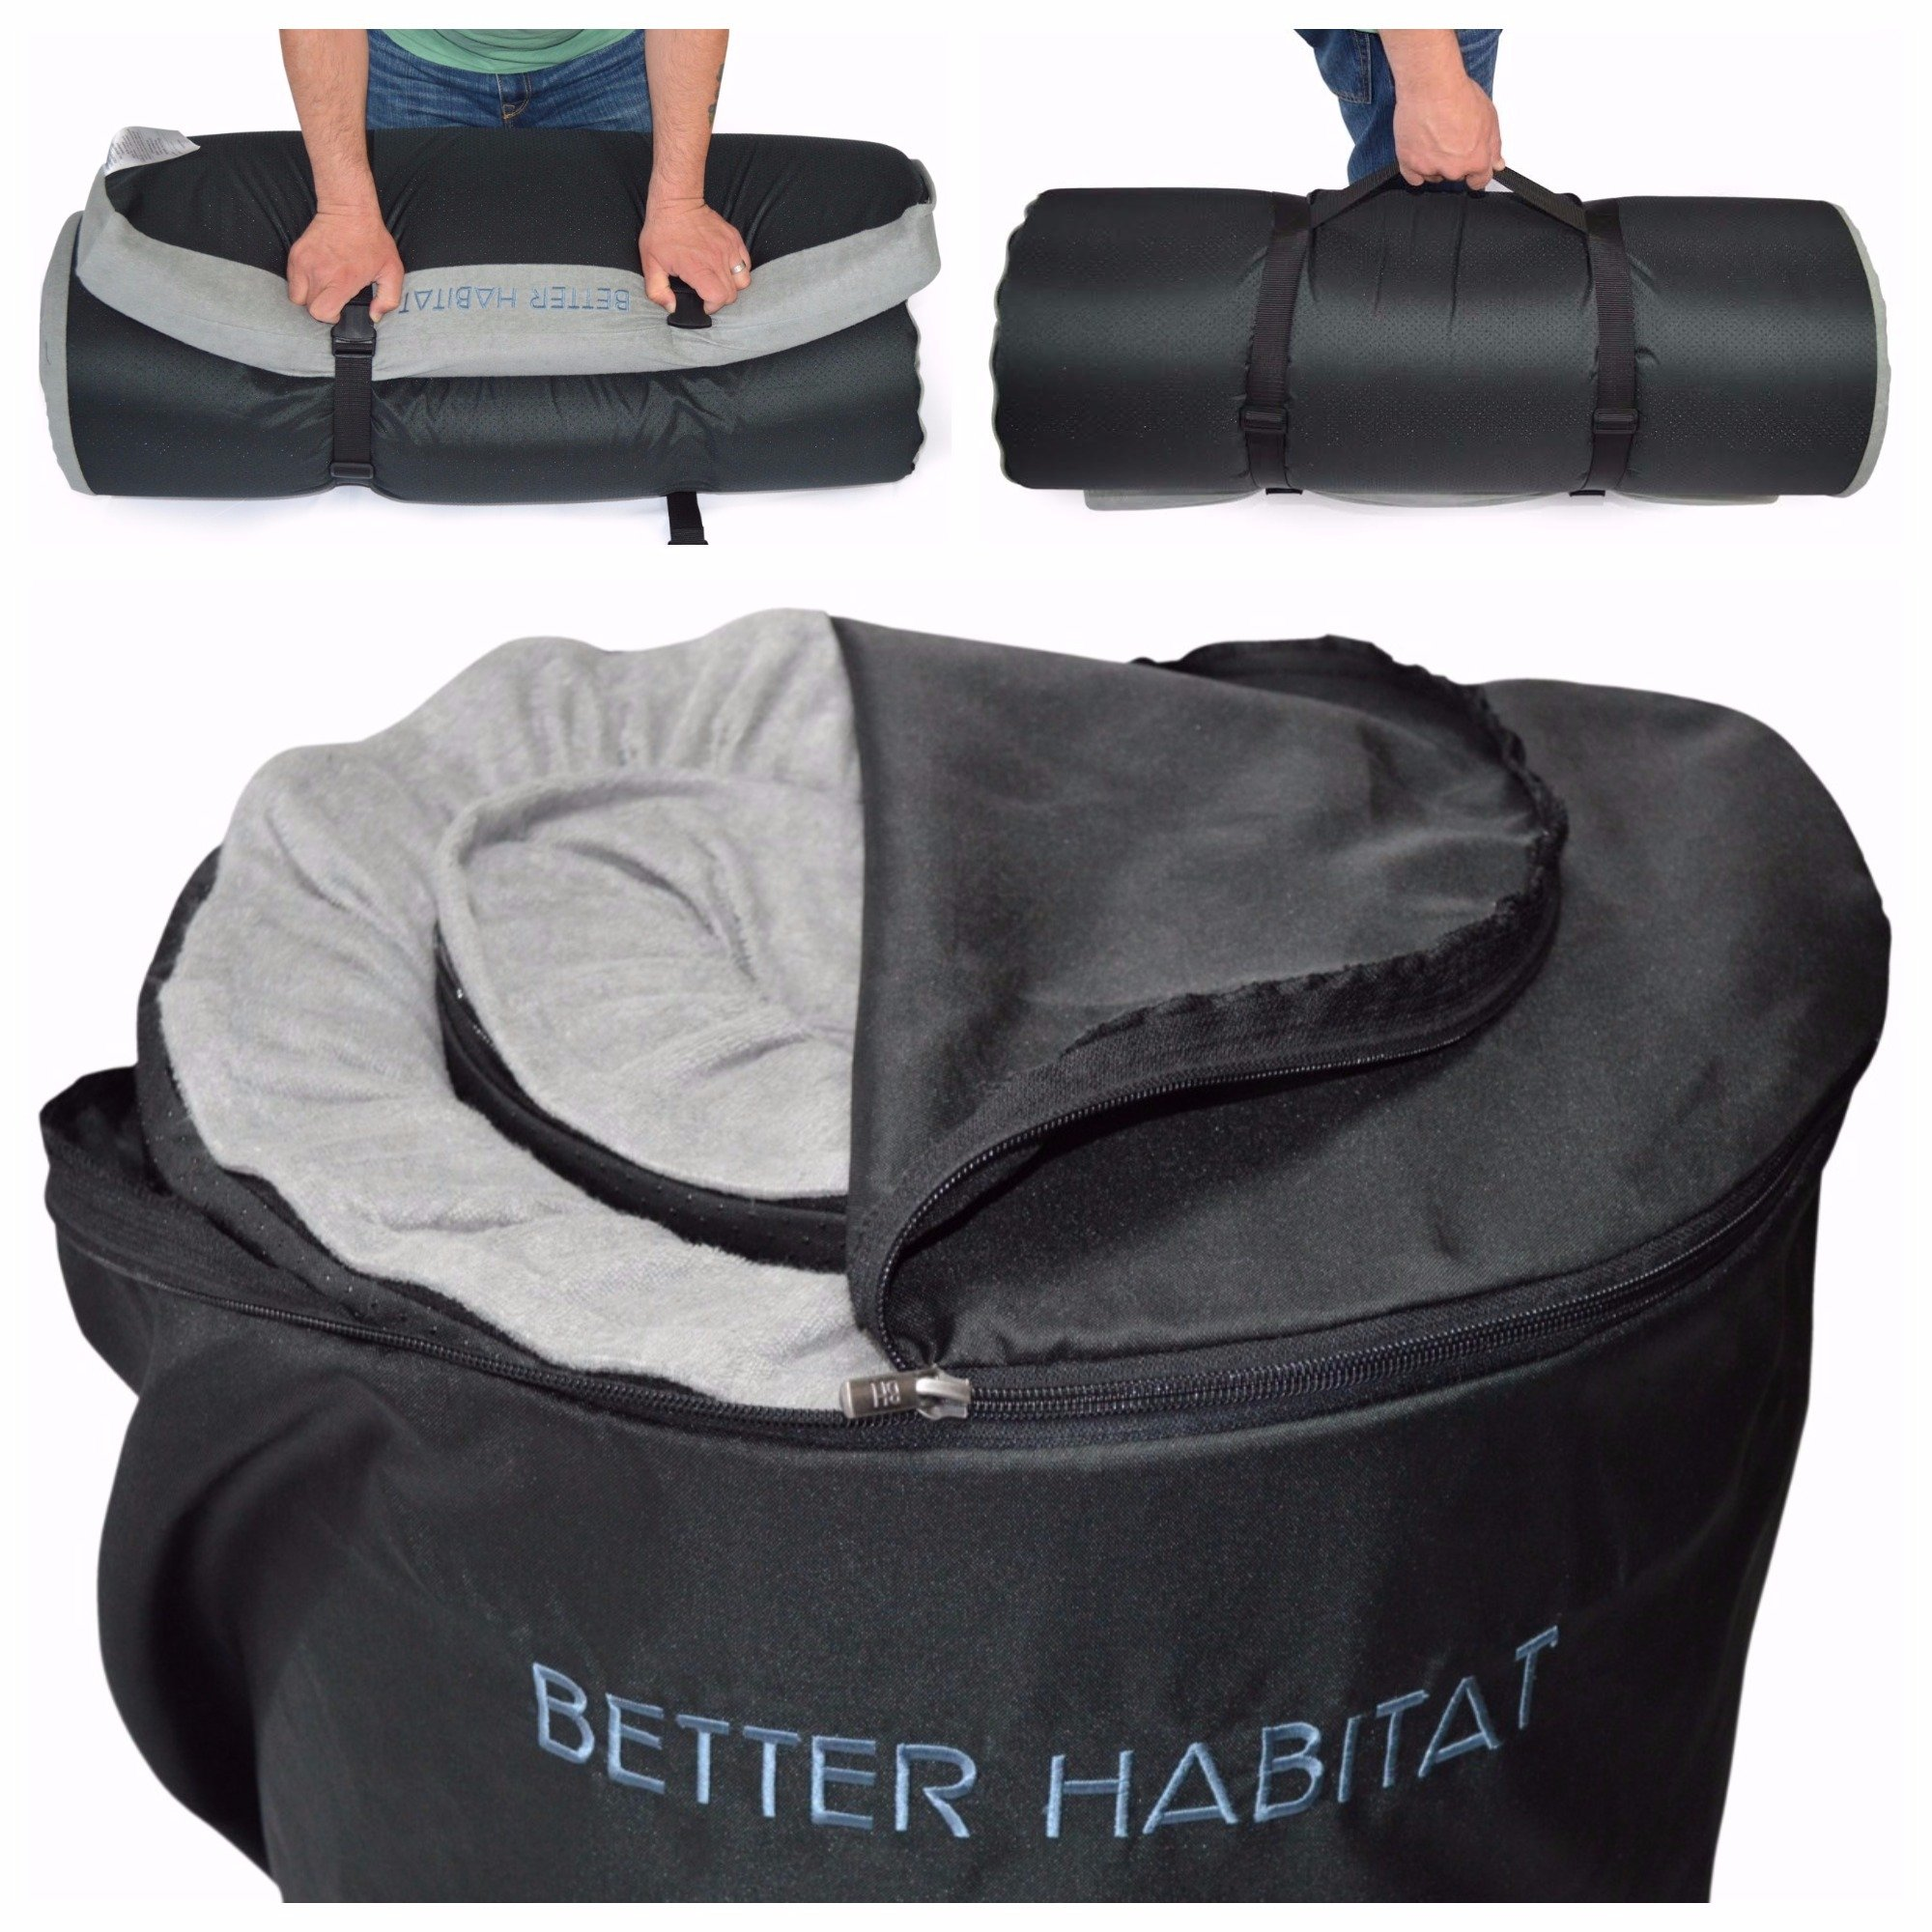 [NEW] Better Habitat SleepReady Memory Foam Floor Mattress (75 x 36''). [Roll out, Portable sleeping pad w/ waterproof cotton terry cover & travel bag] by Better Habitat (Image #5)